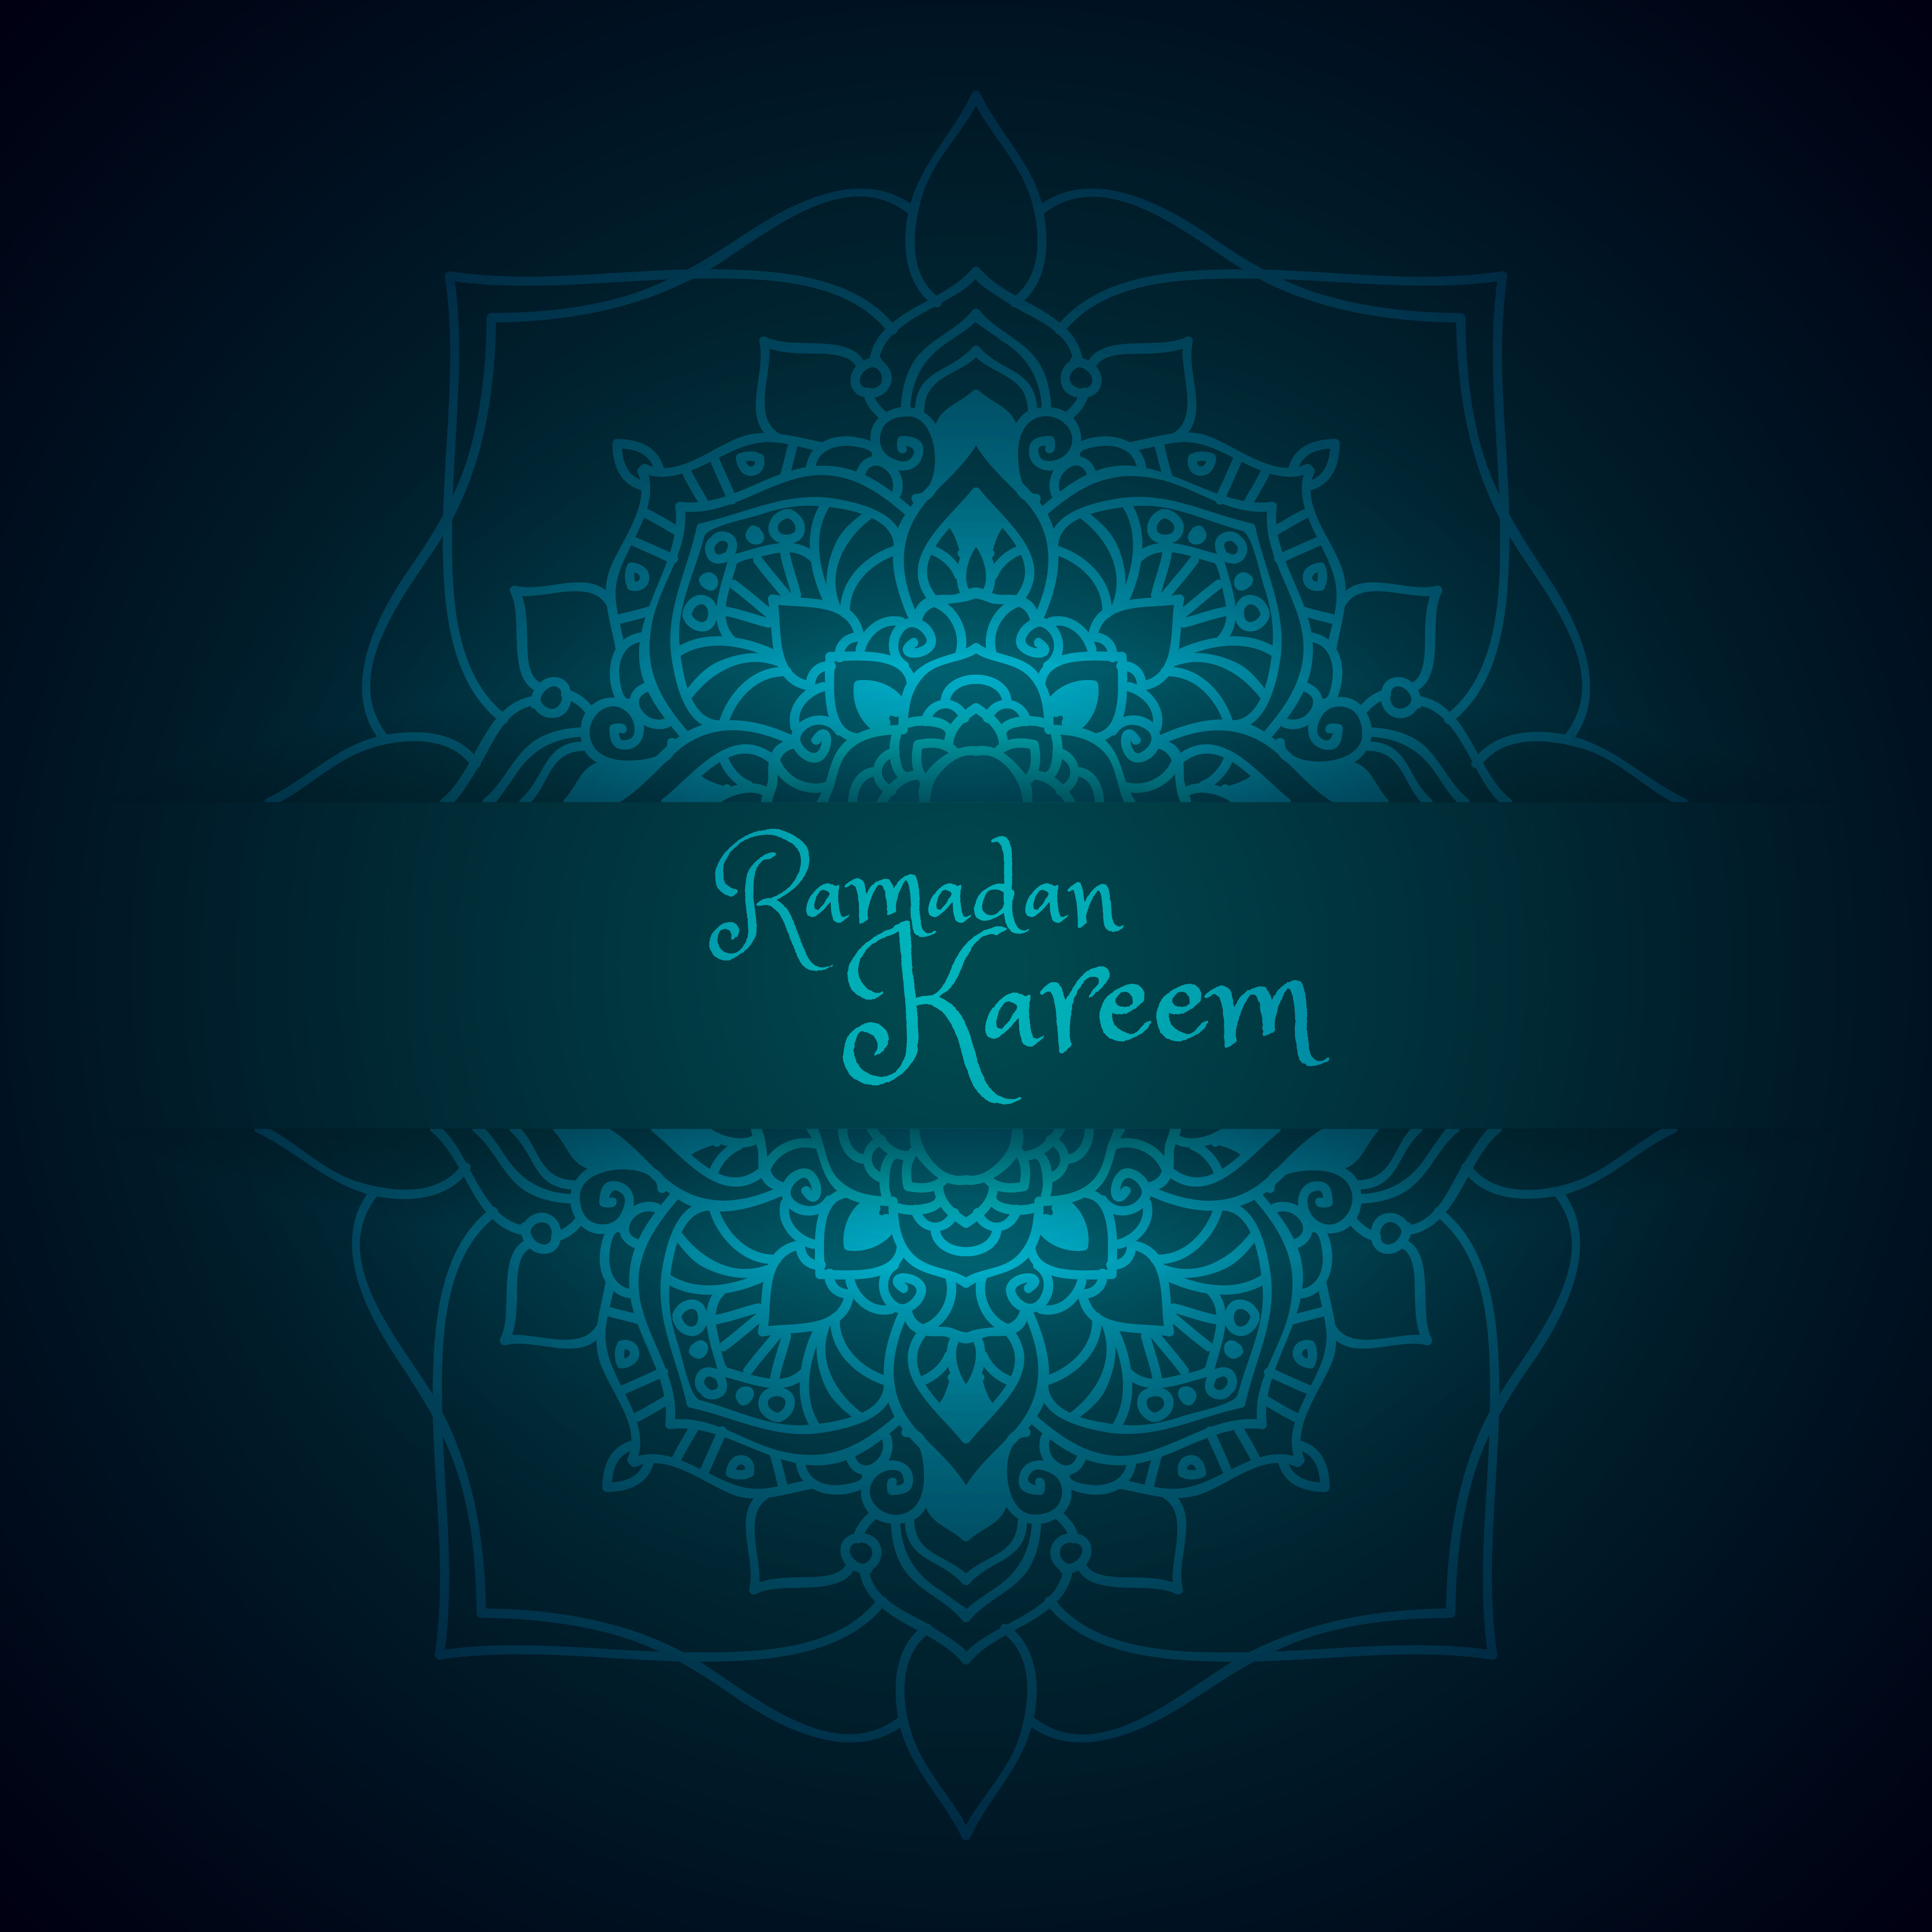 Ramadan greeting with mandala pattern - Download Free